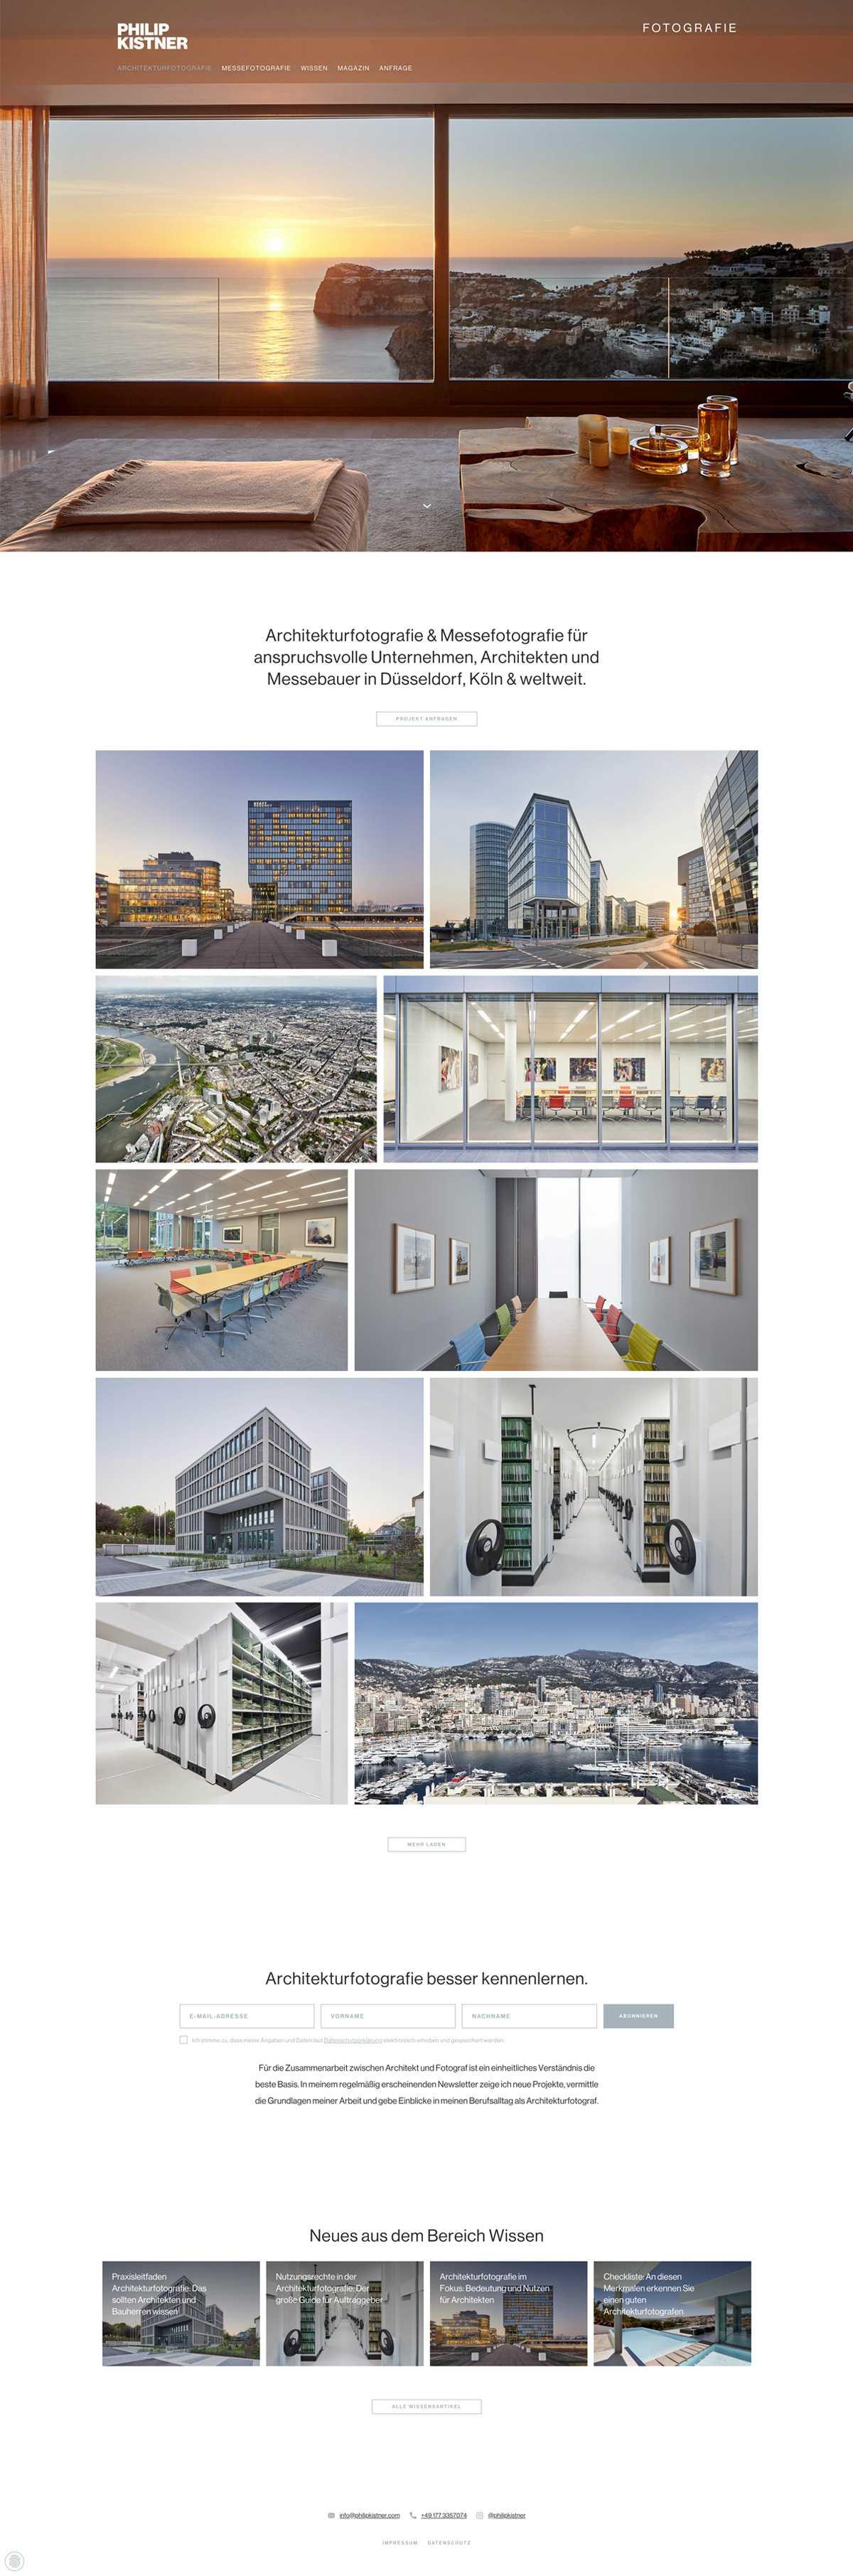 Architekturfotografie Startseite Desktop - Philip Kistner